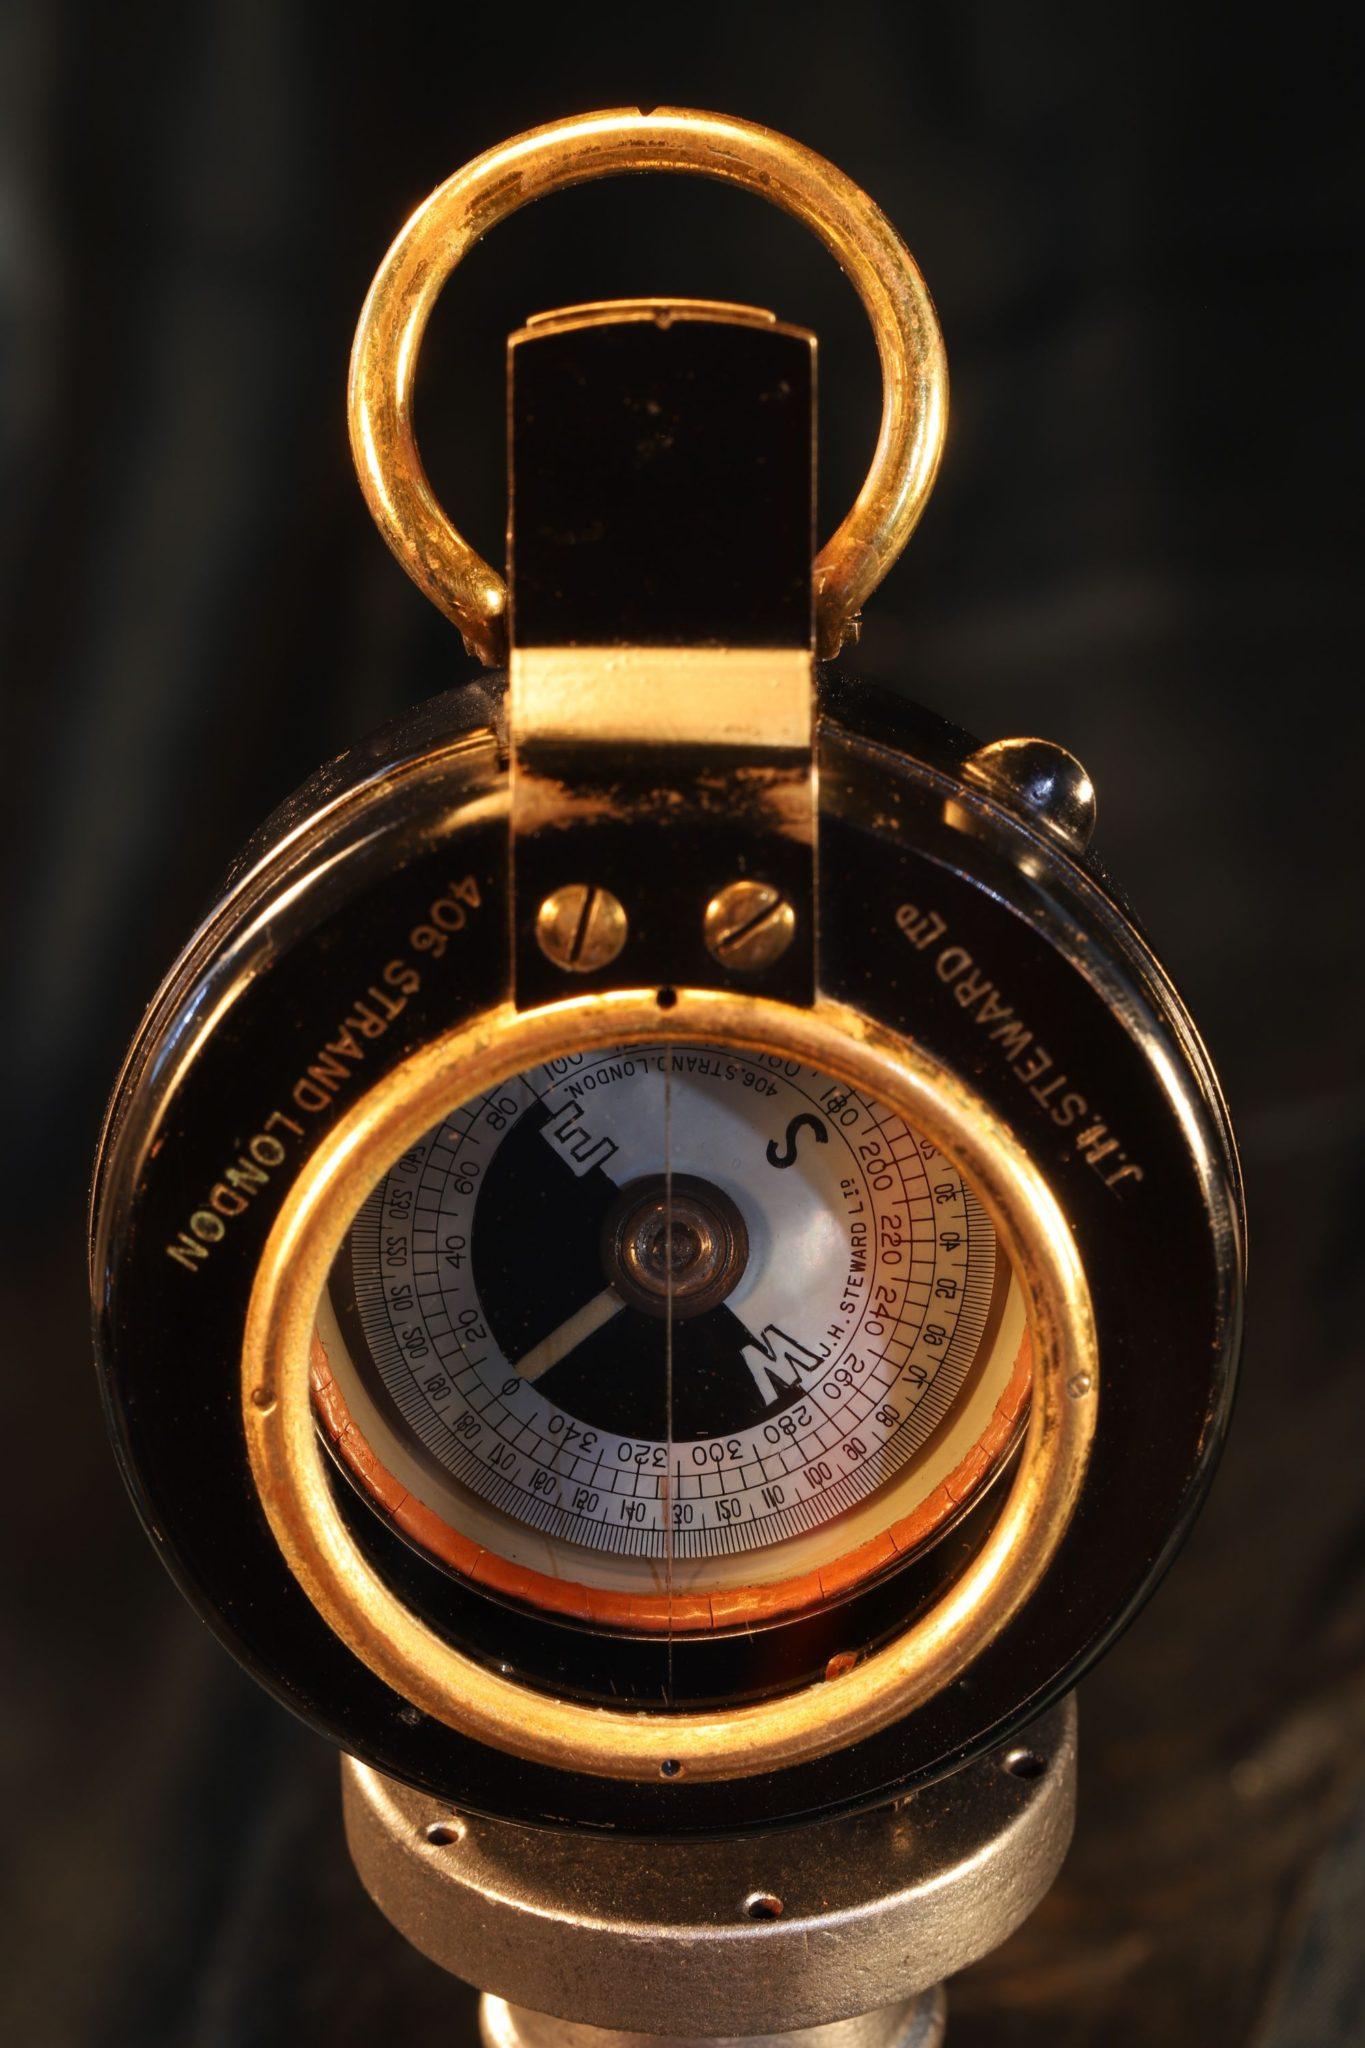 Image of Steward Liquid Prismatic Compass c1916